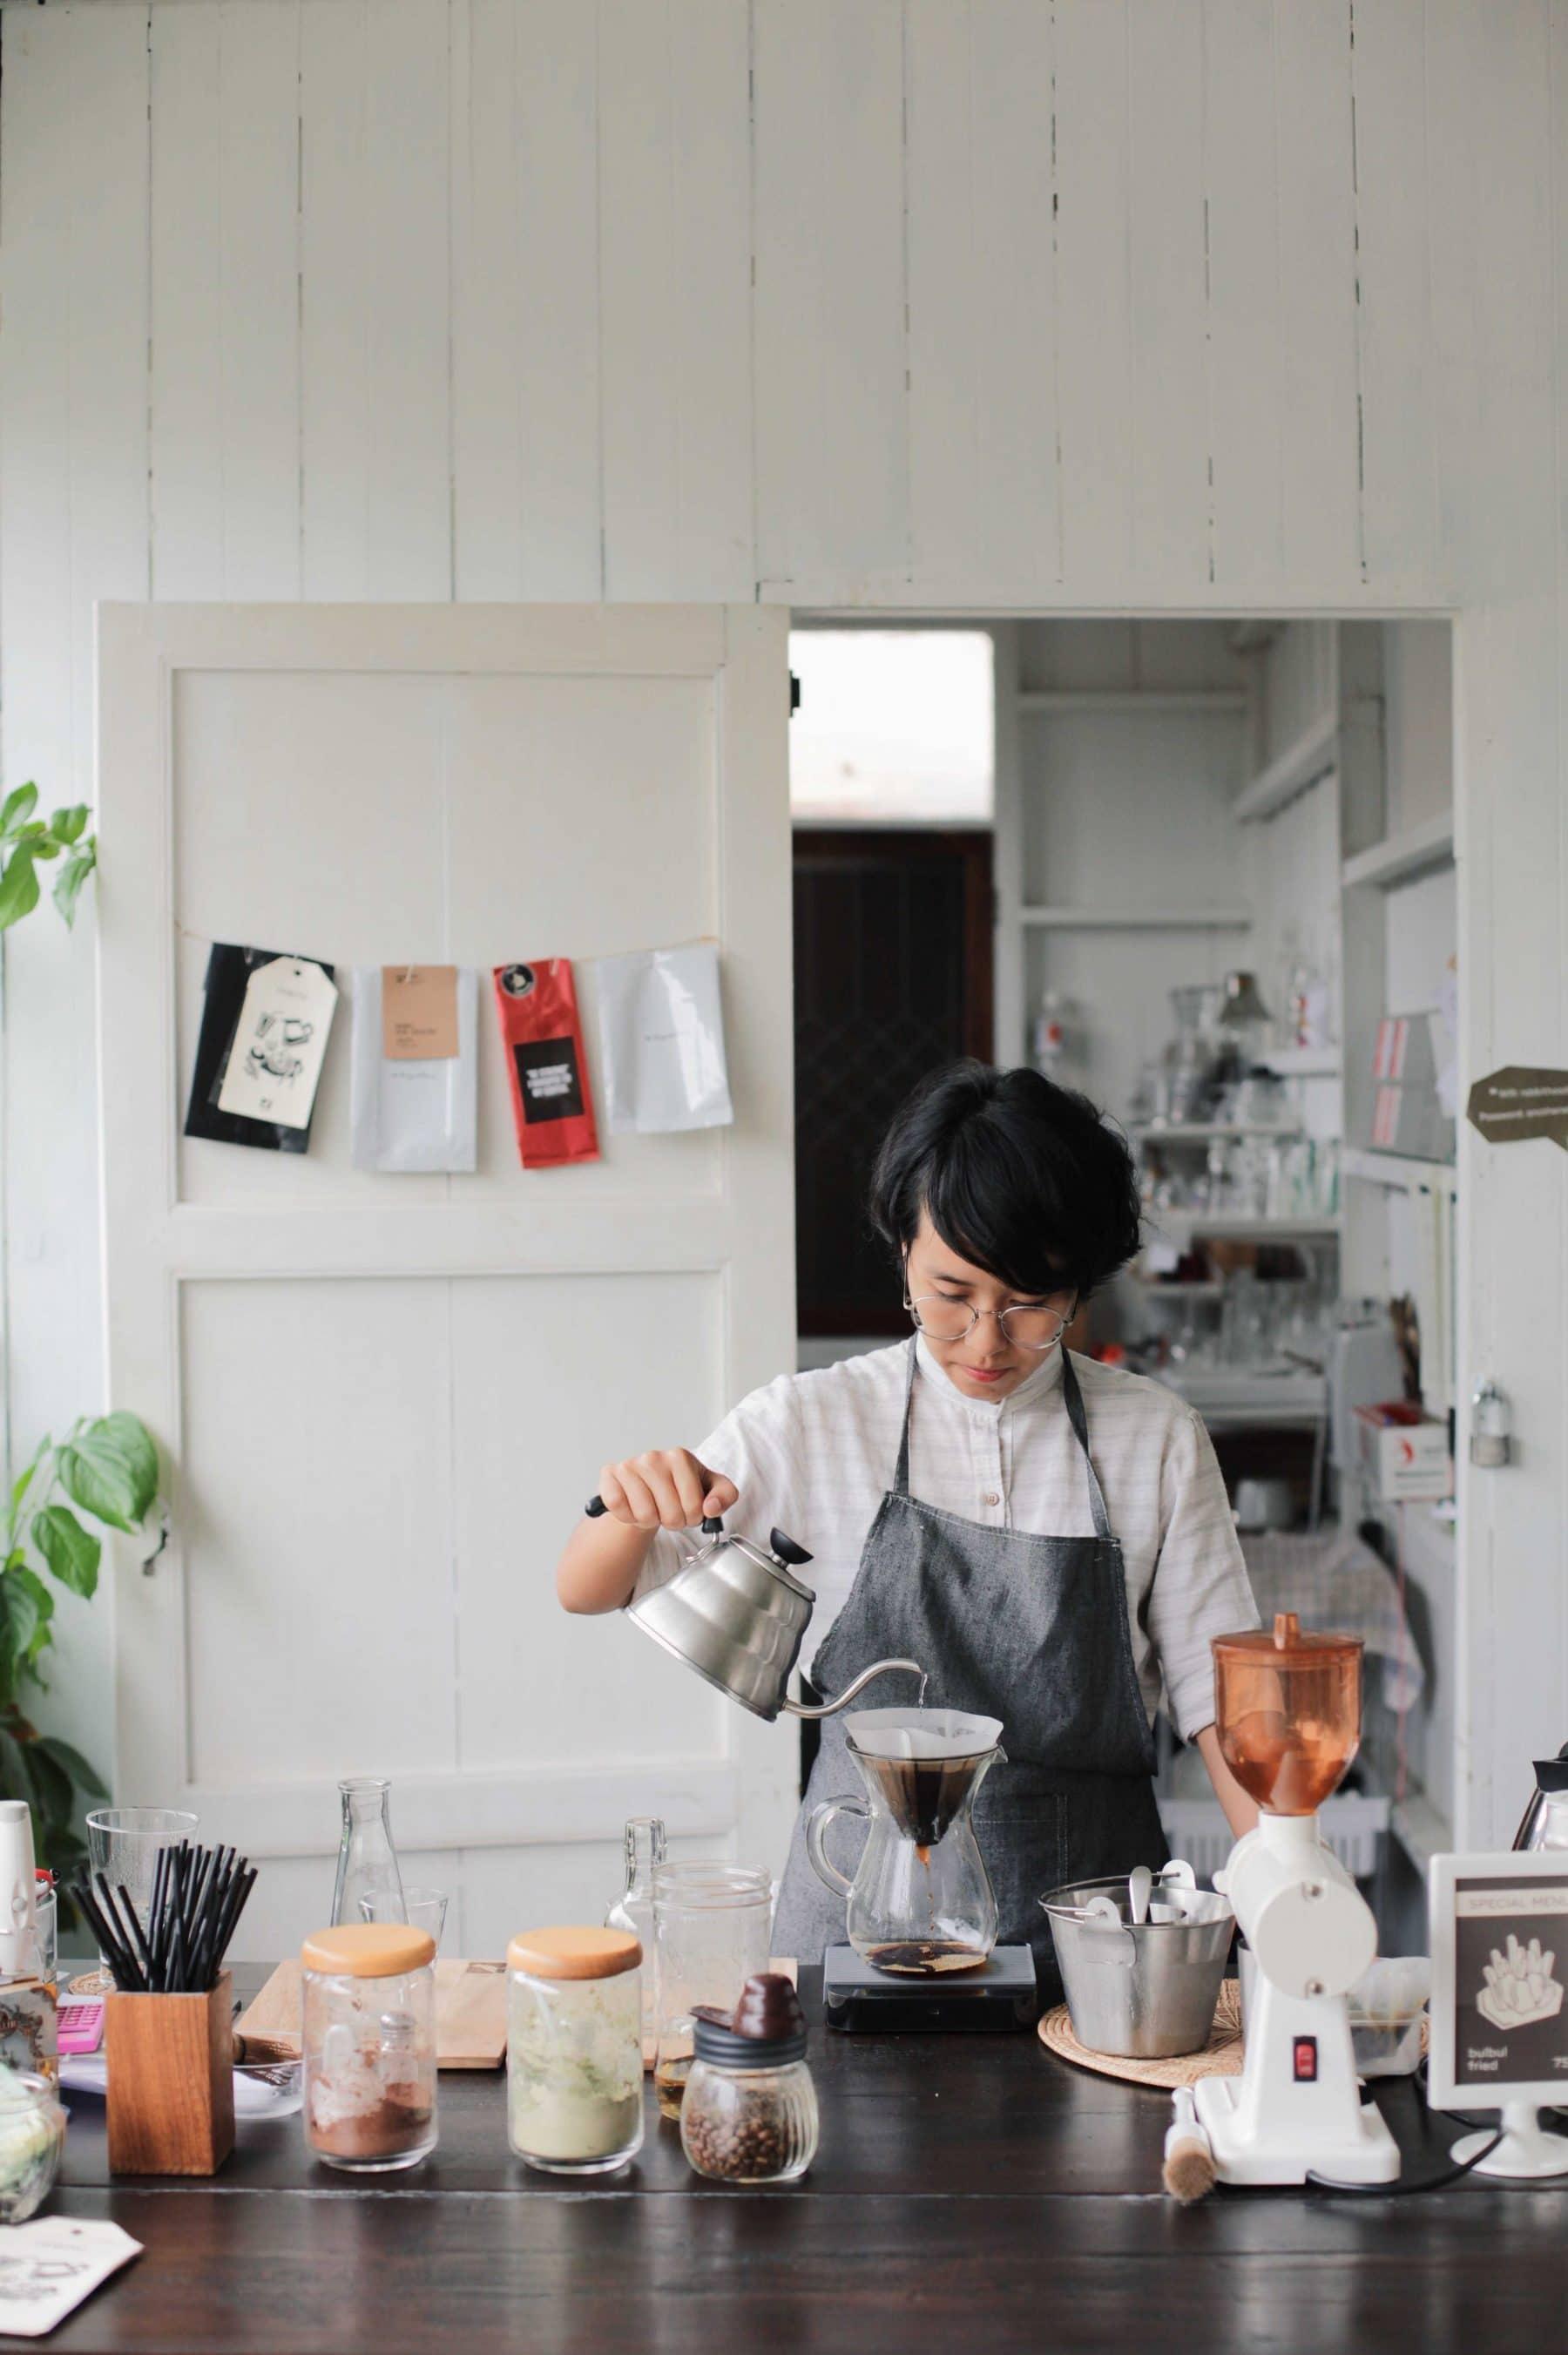 Kinlake-Bulbul-Cafe-Chiang-Mai